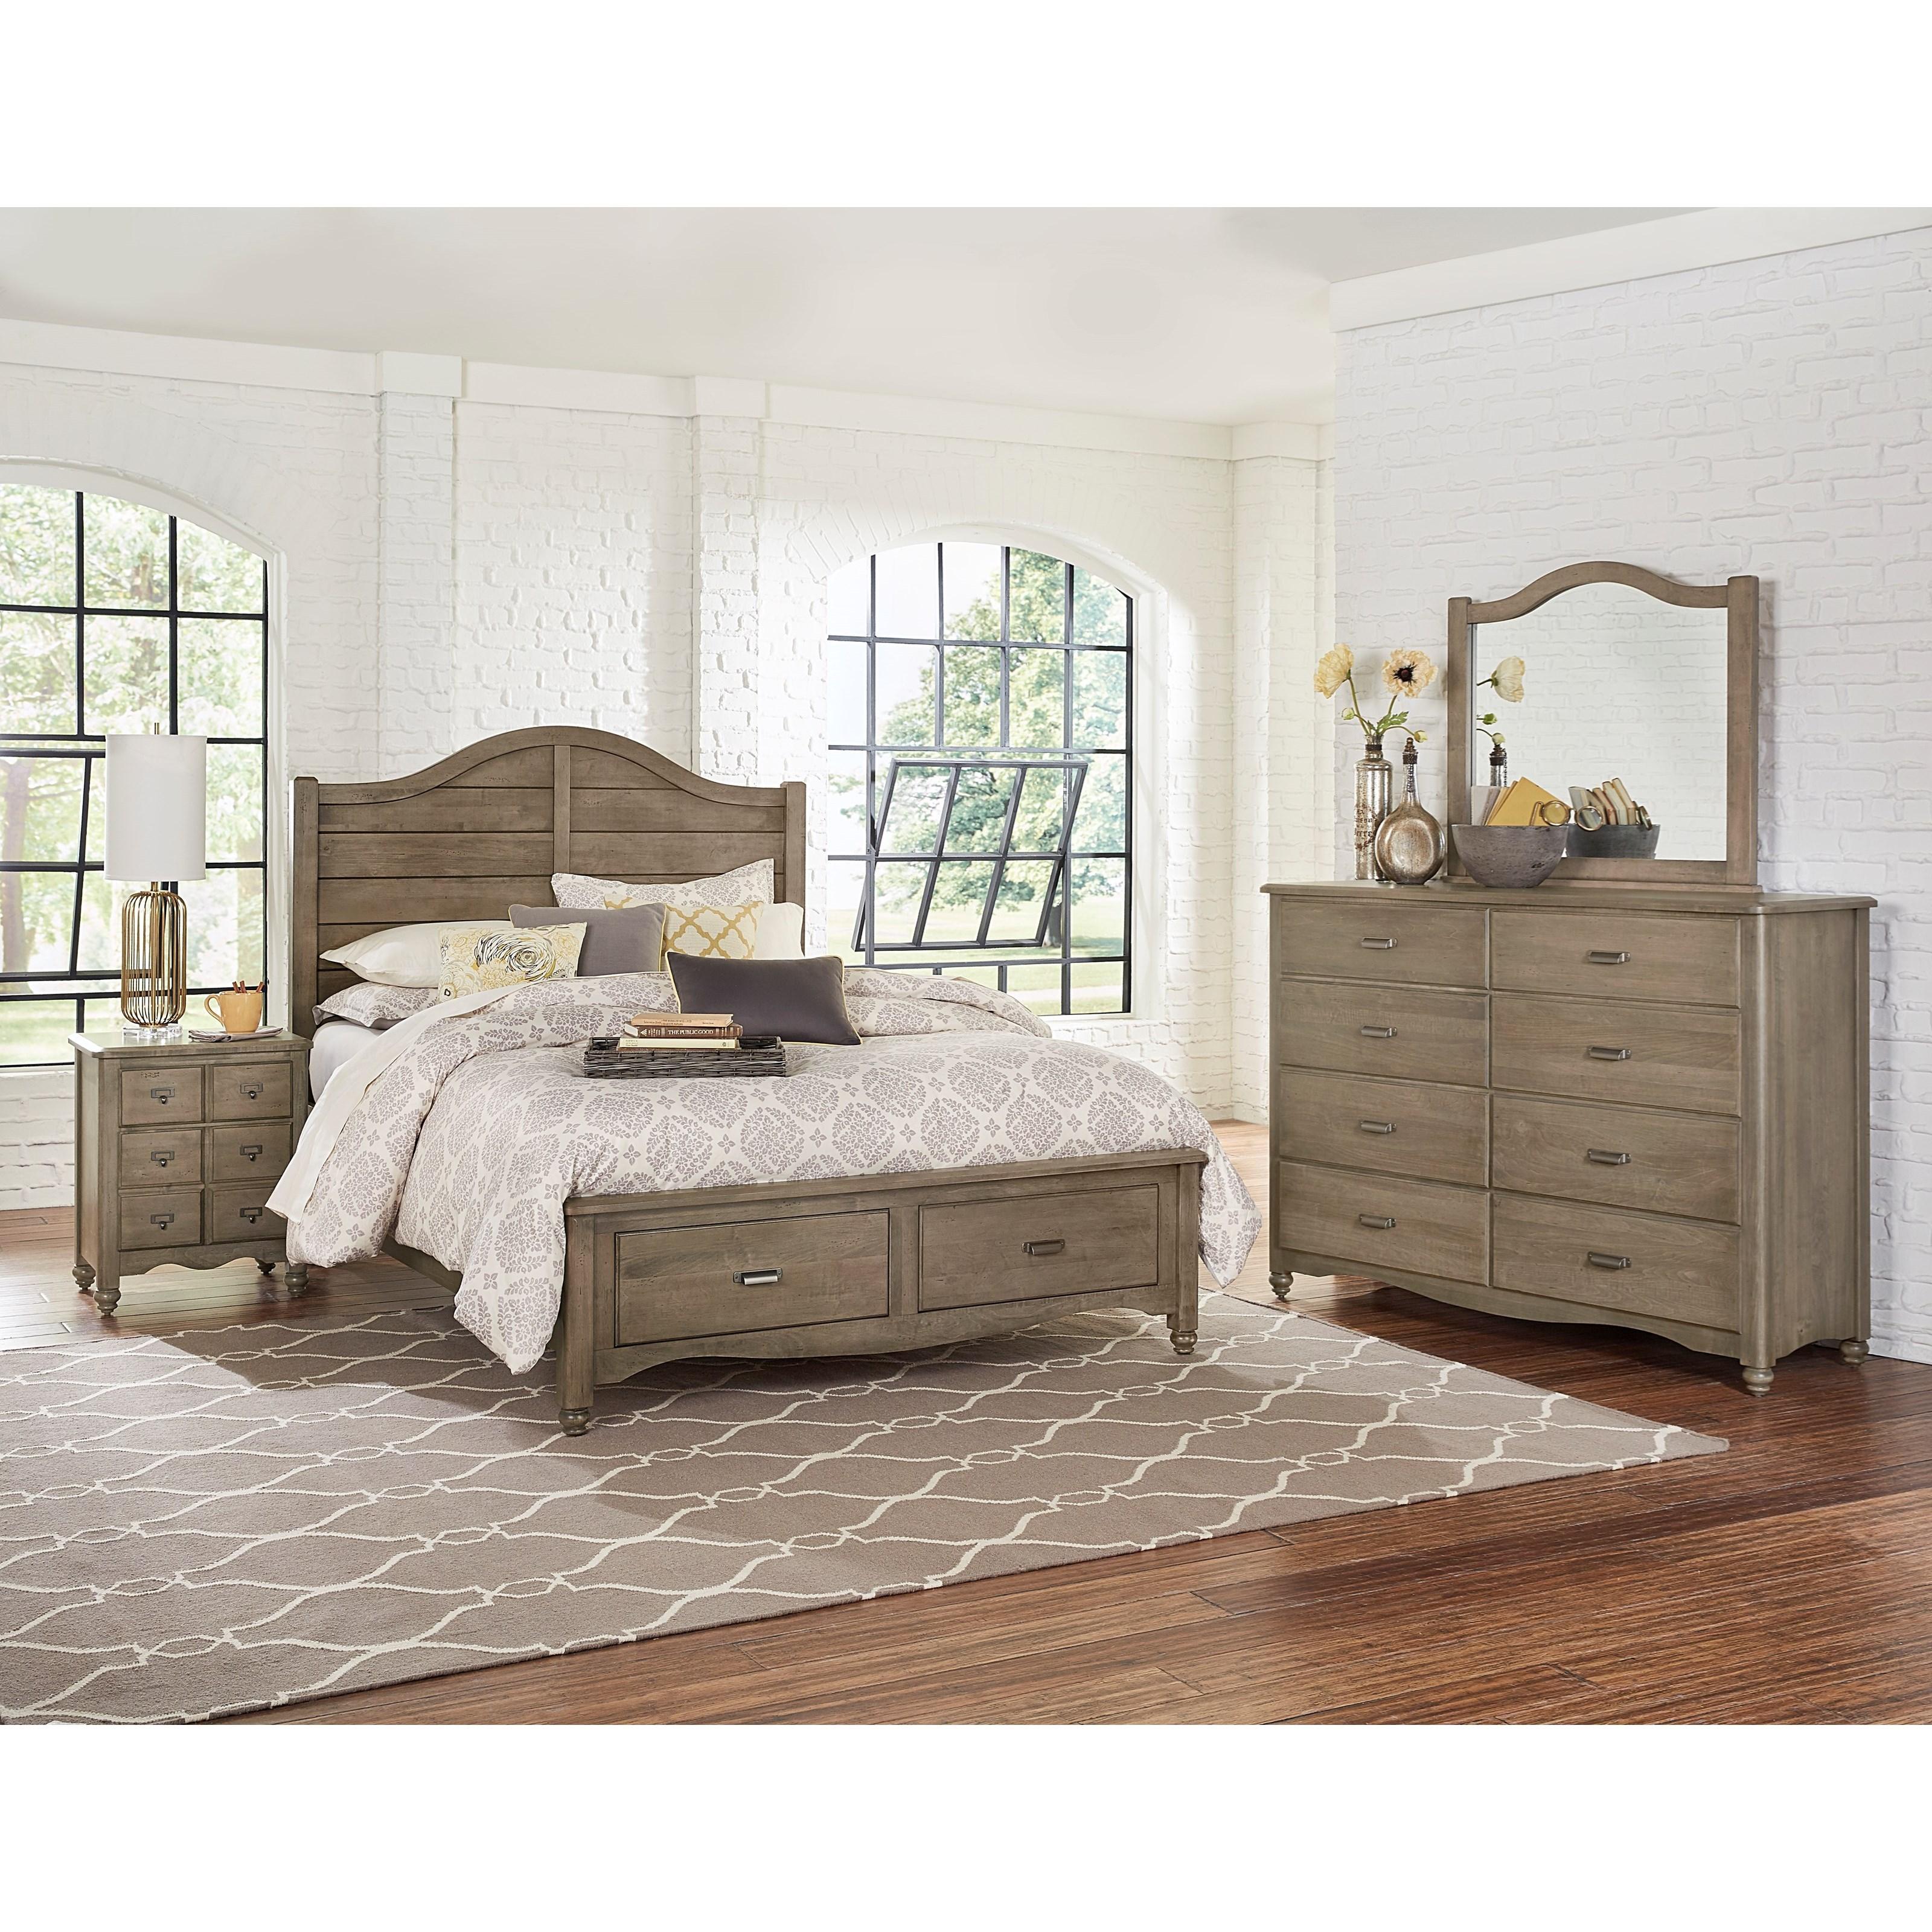 Vaughan Bassett Bedroom Set: Vaughan Bassett American Maple King Bedroom Group